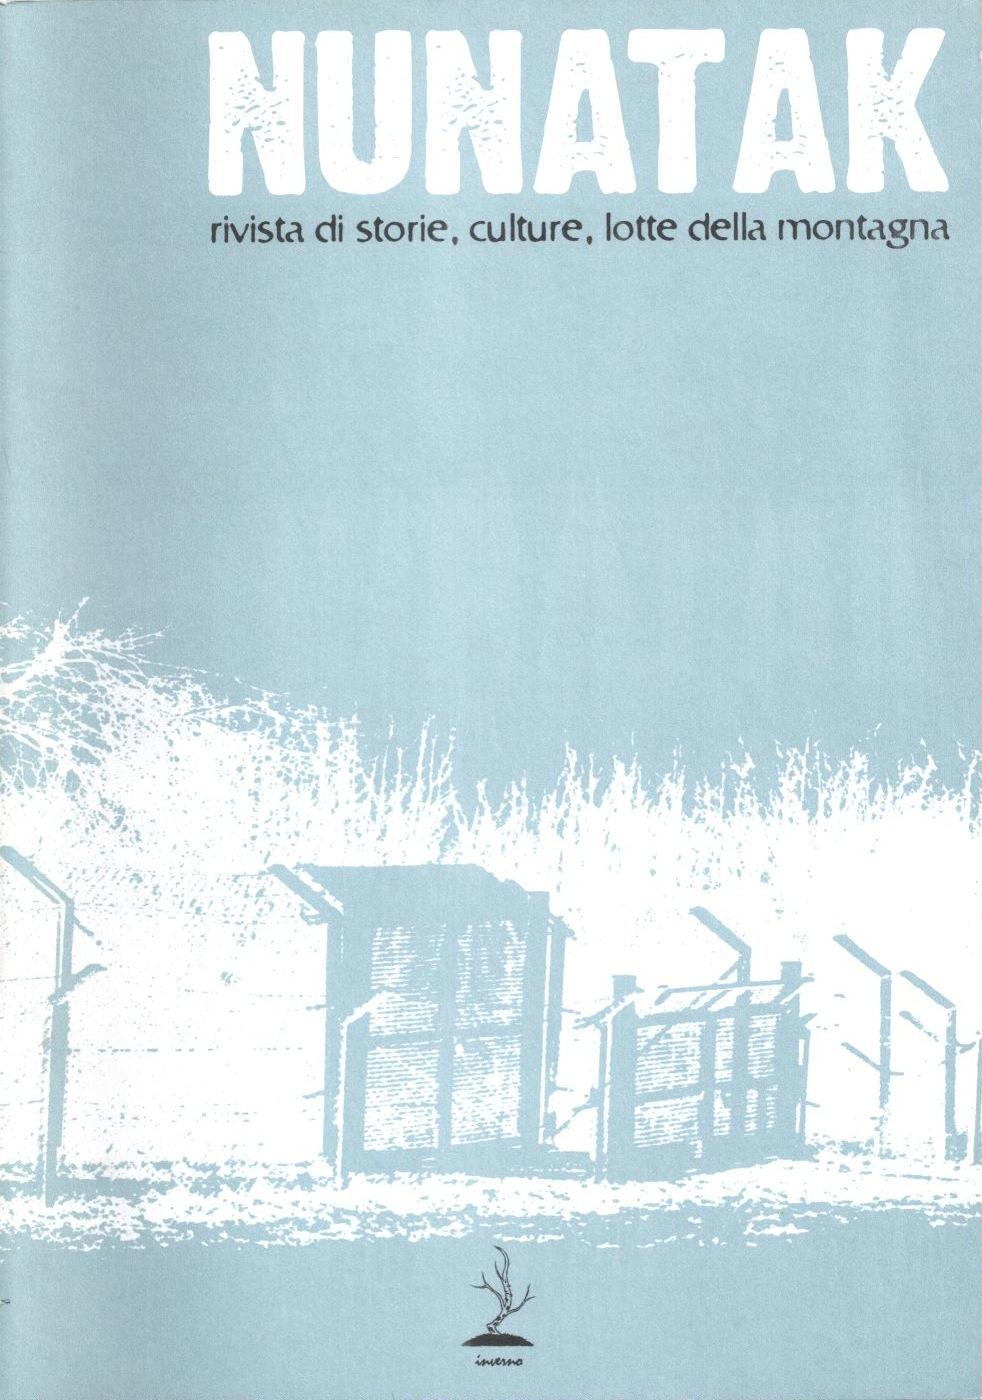 Nunatak n. 17 Book Cover